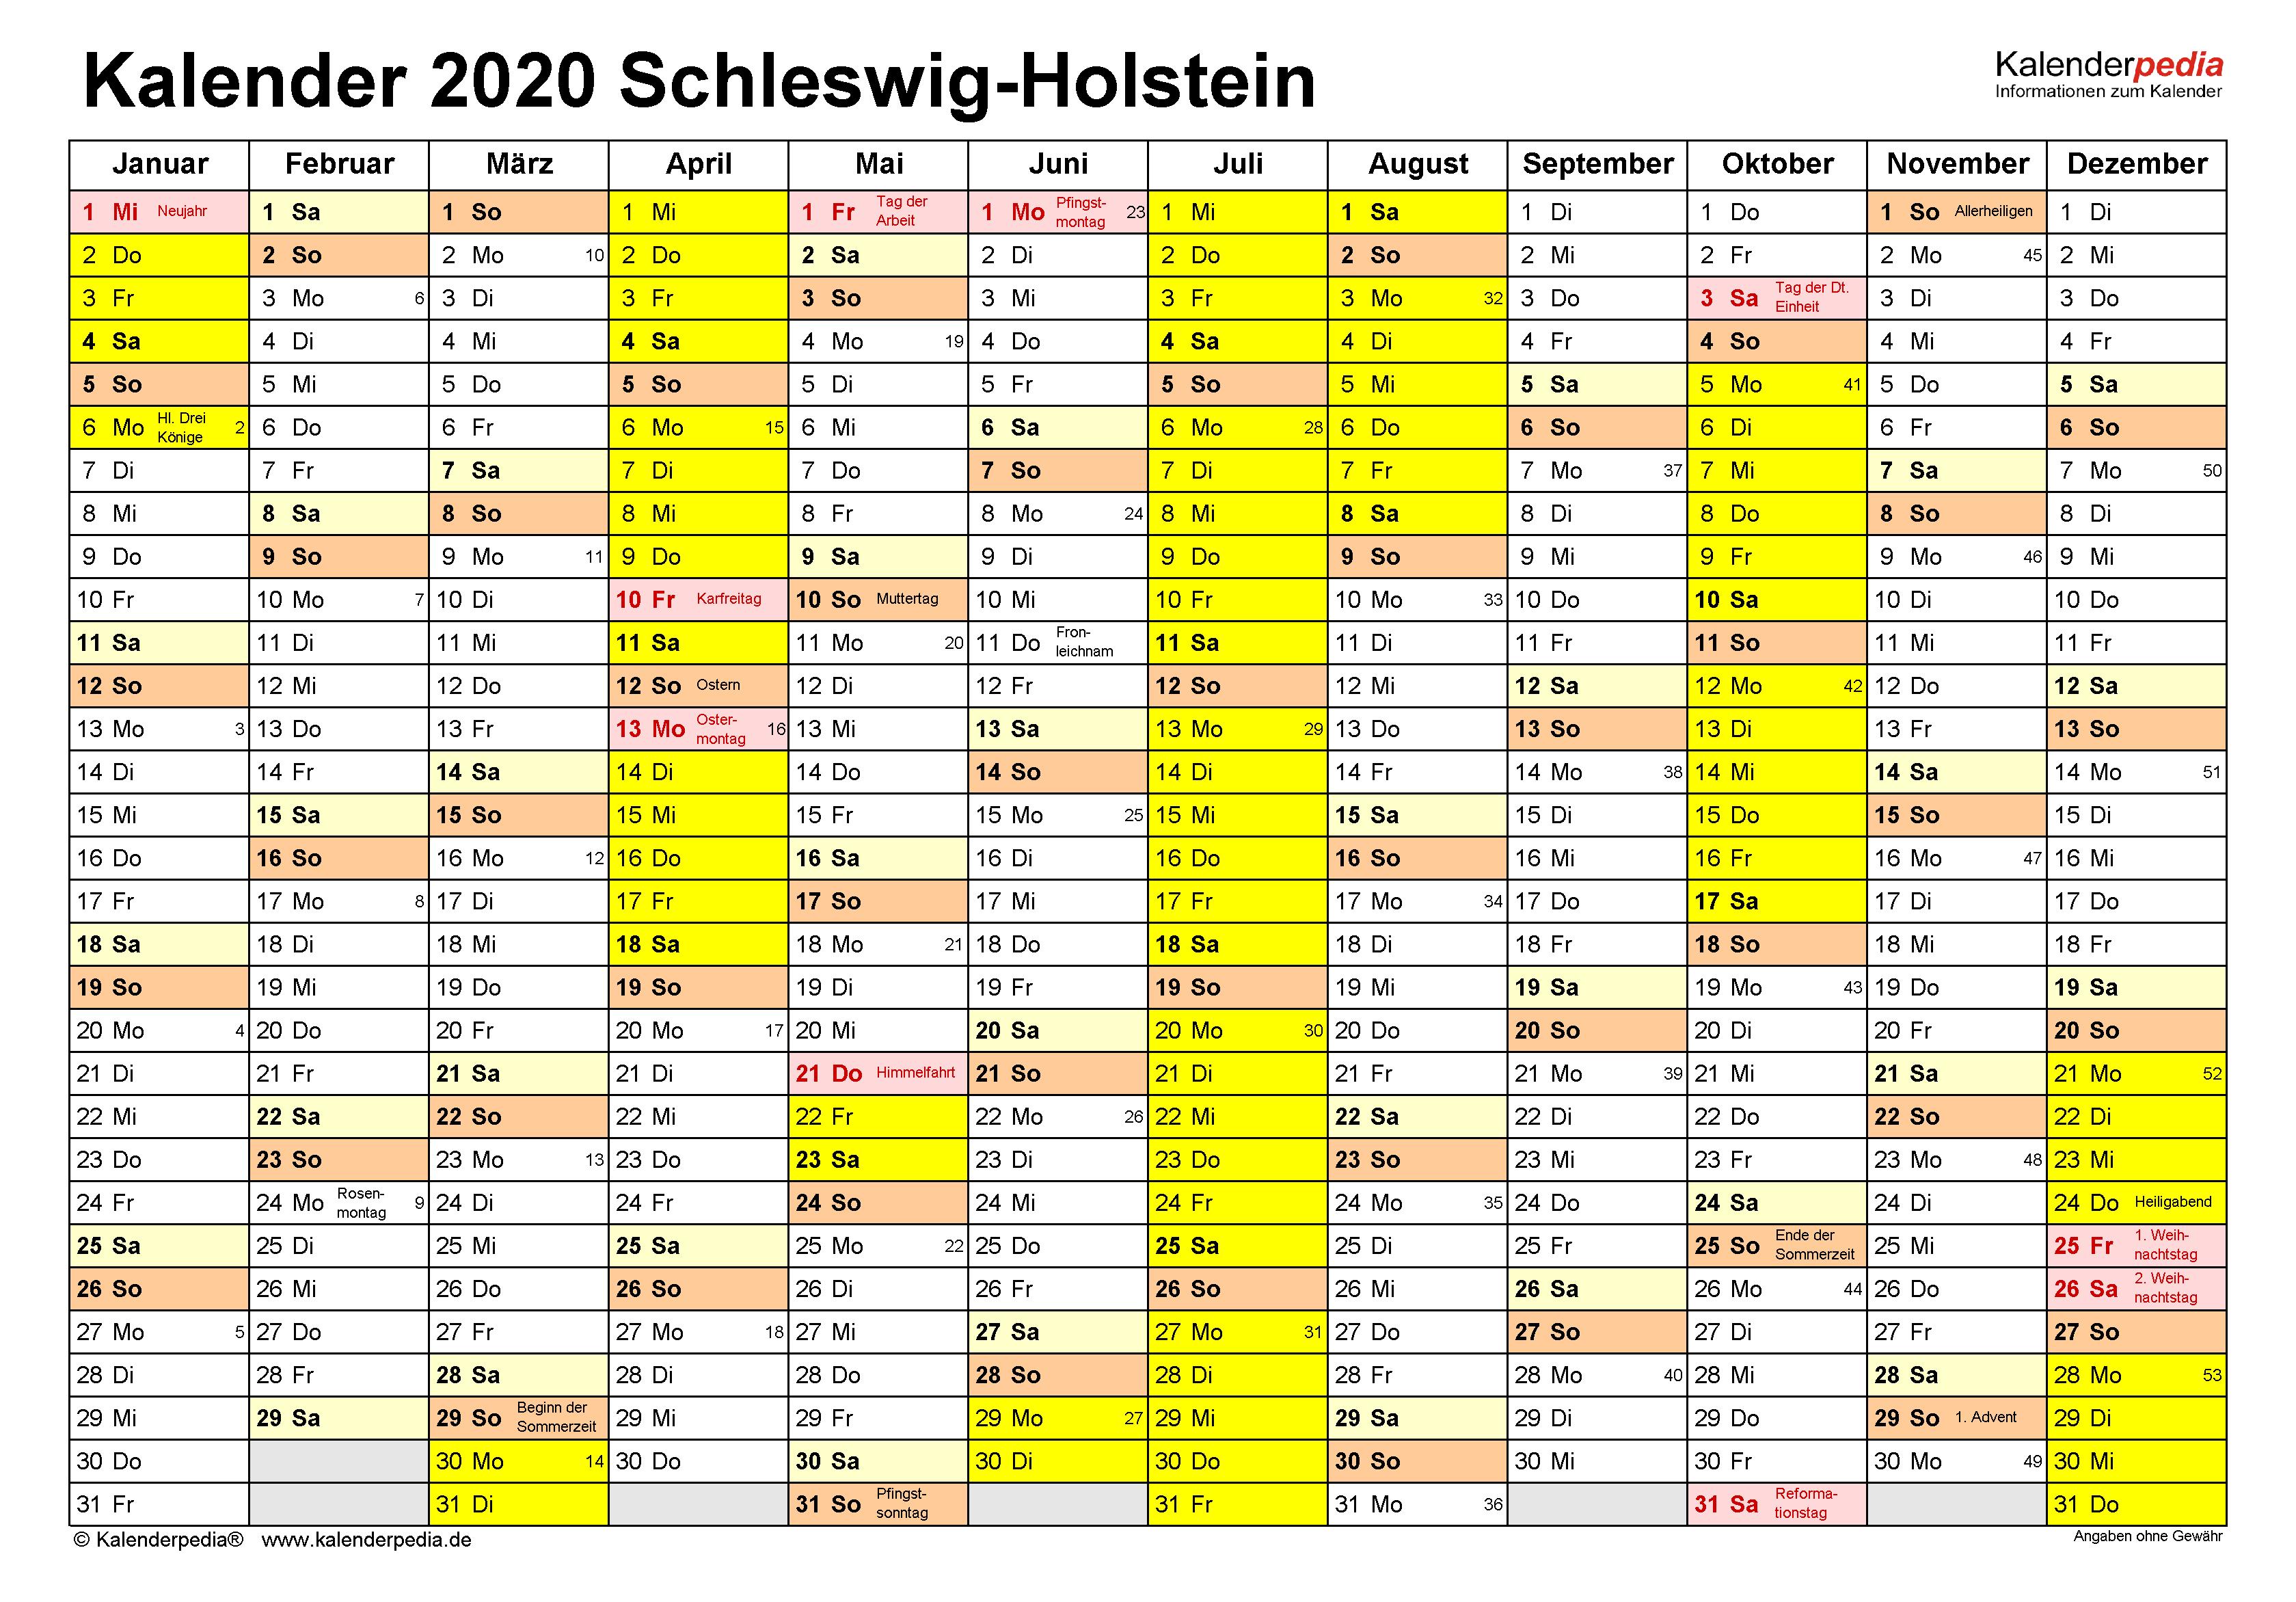 Koalitionsvertrag Schleswig Holstein 2020